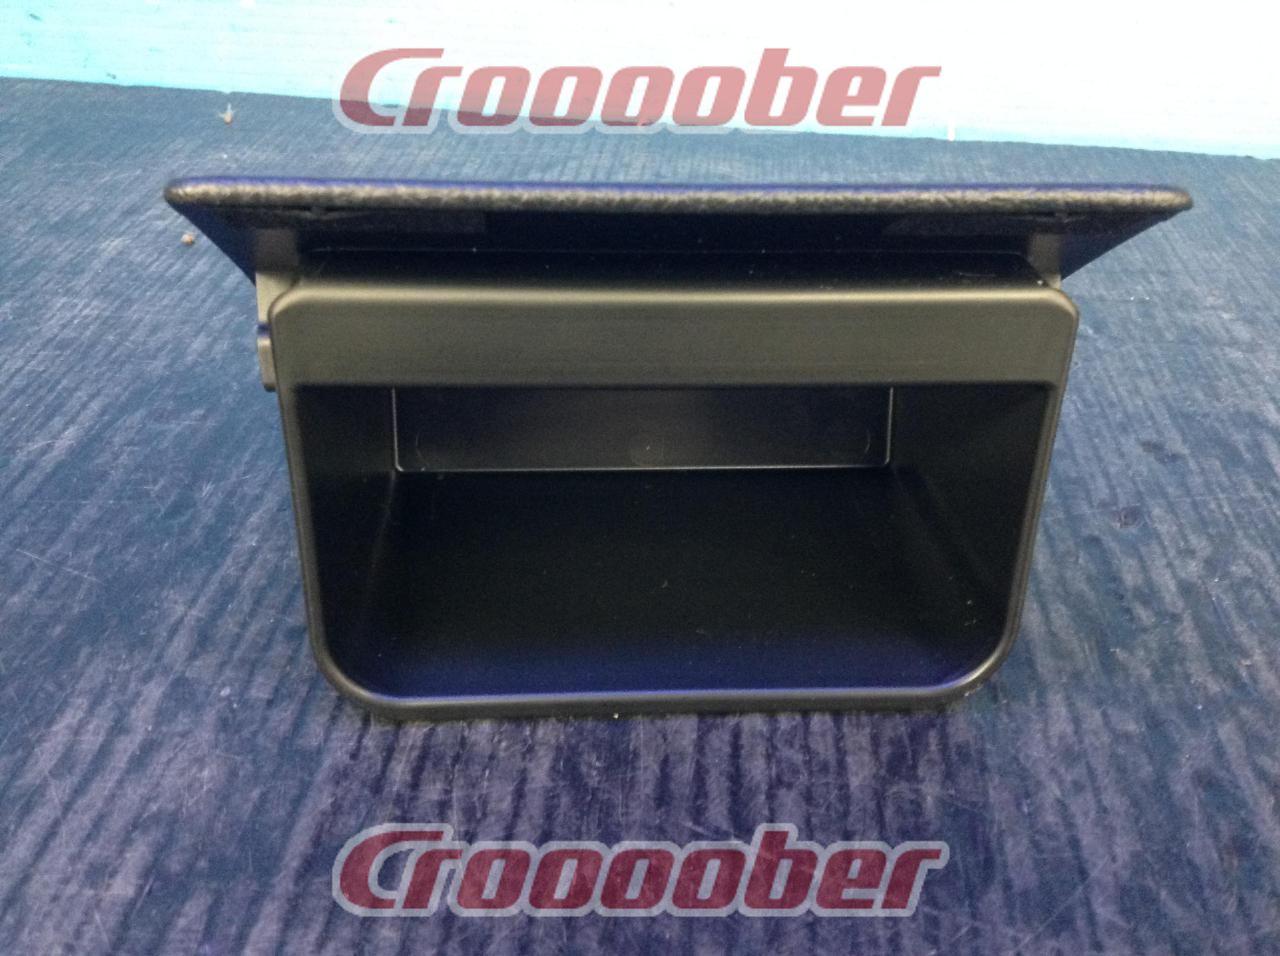 hight resolution of subaru revu ogu genuine fuse box panel interior accessories croooober